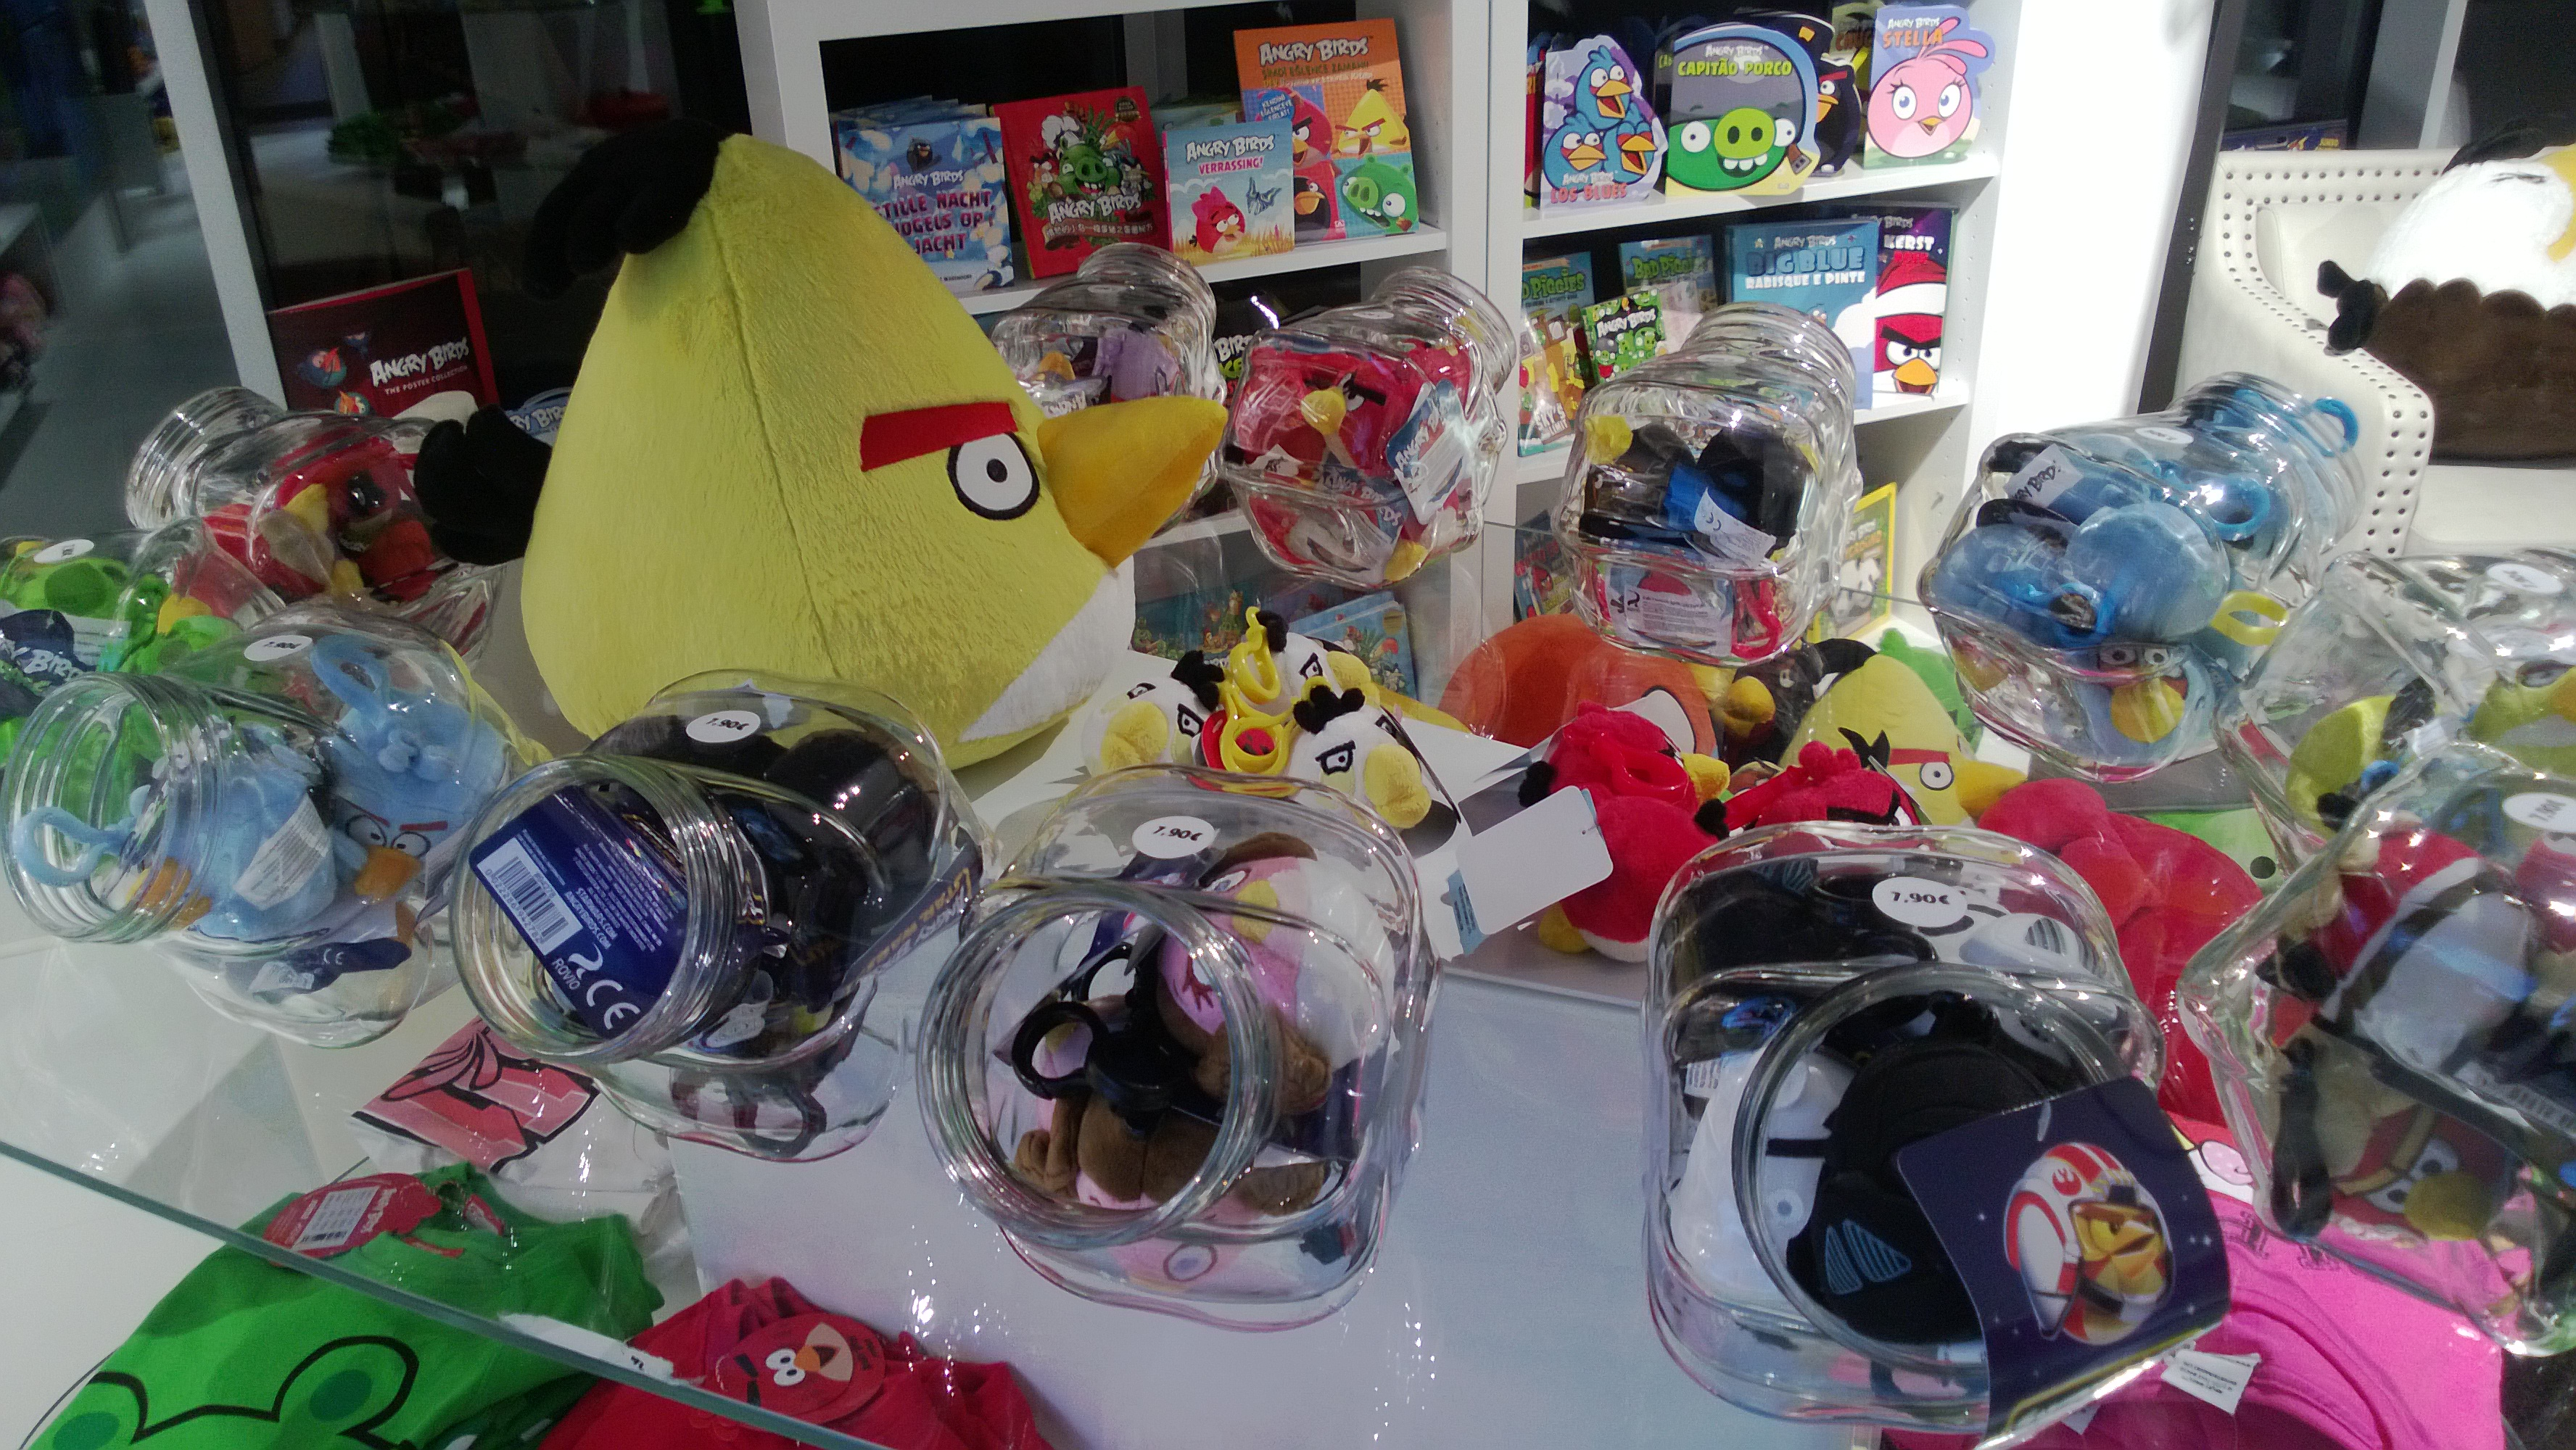 Angry Birds merchandise at Rovio HQ.